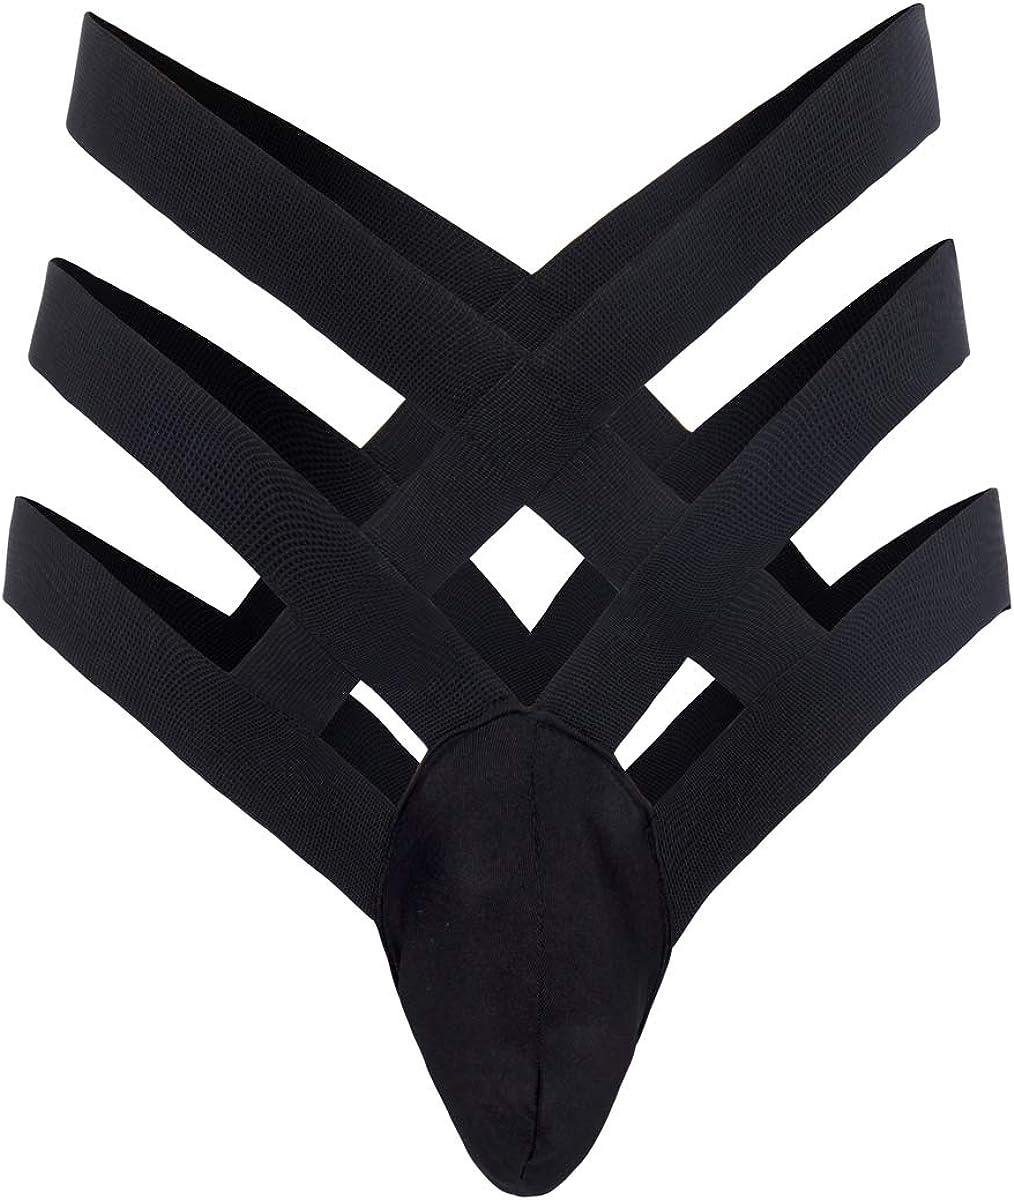 IWEMEK Uomo Hollow Out Underwear Bendaggio Atletico Vita Alta Jockstrap Erotico Boxer Shorts Mutandine Lingerie Perizoma Bikini Slip Nightwear